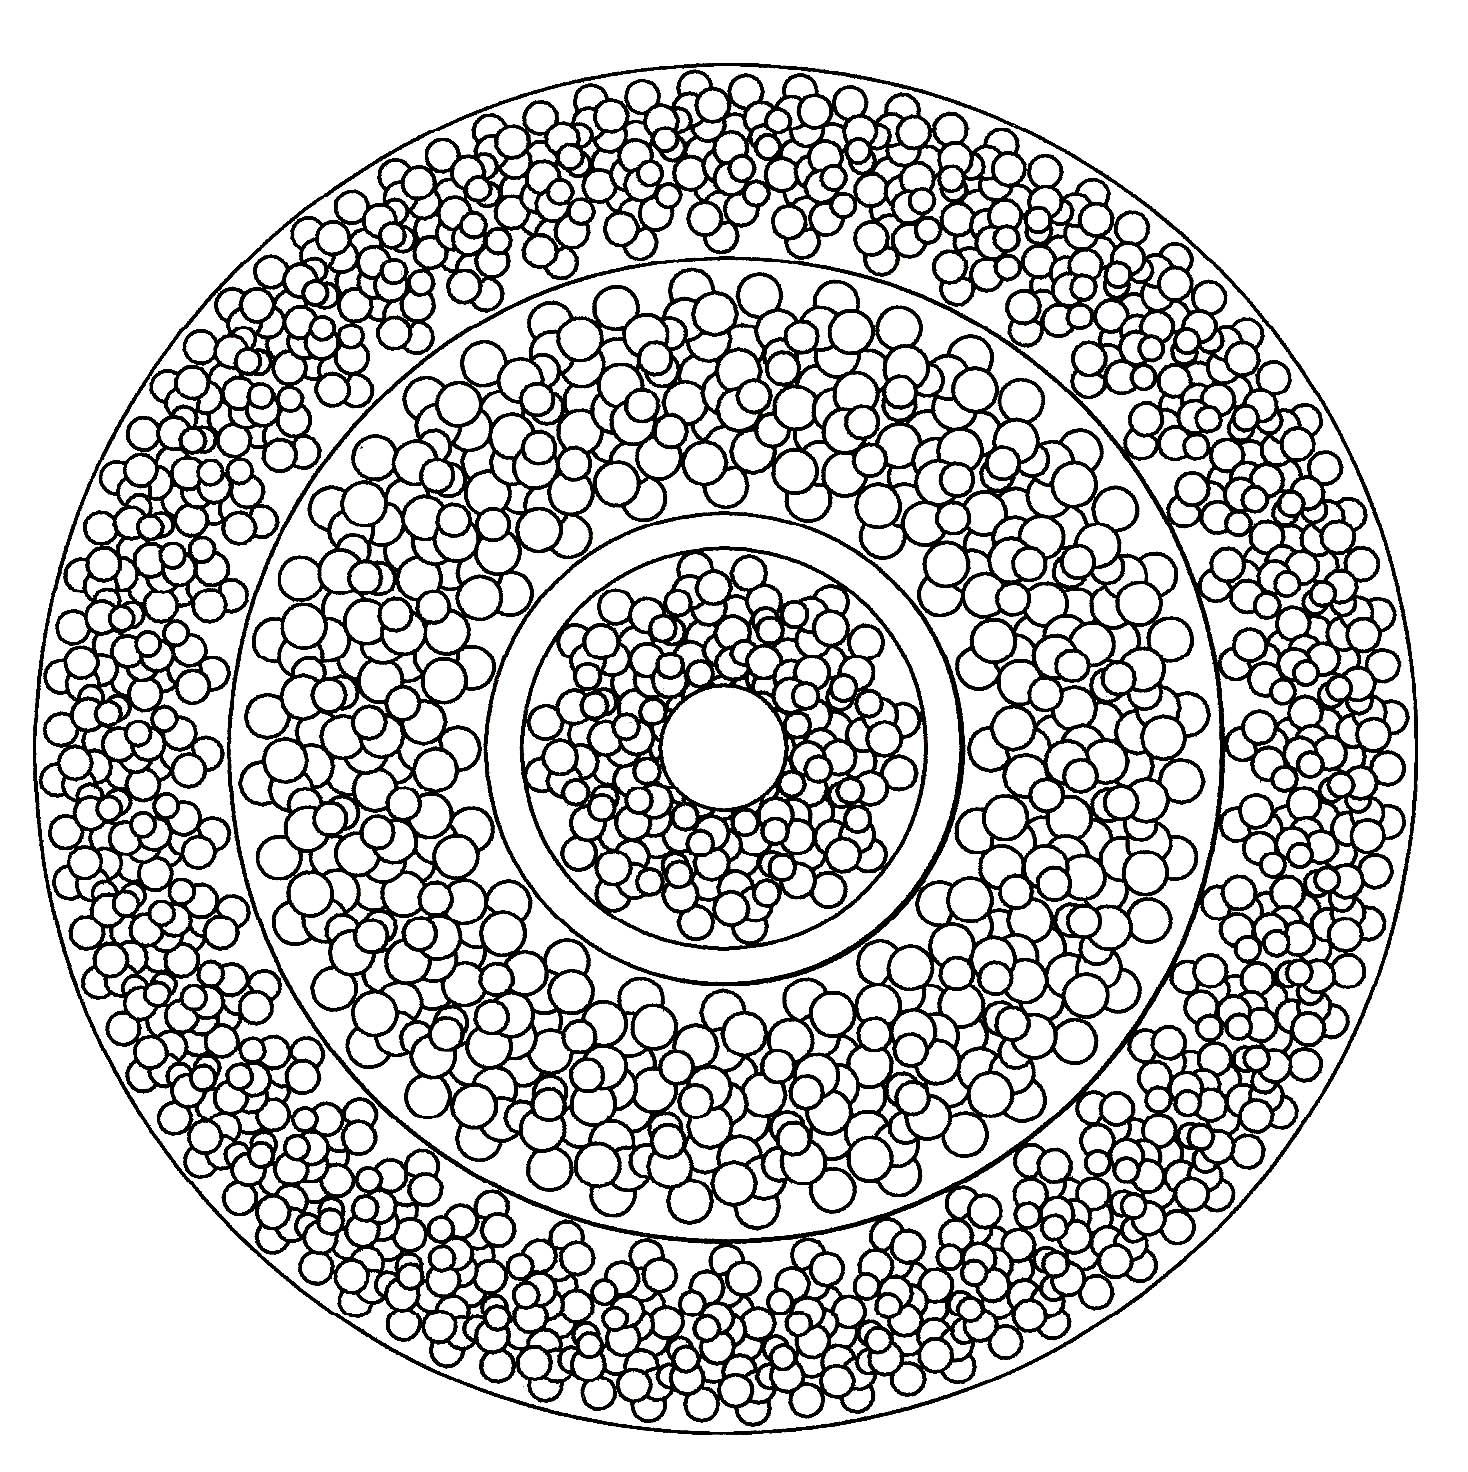 Mandala Facile Geometrique 3 Mandalas Avec Motifs Geometriques 100 Mandalas Zen Anti Stress